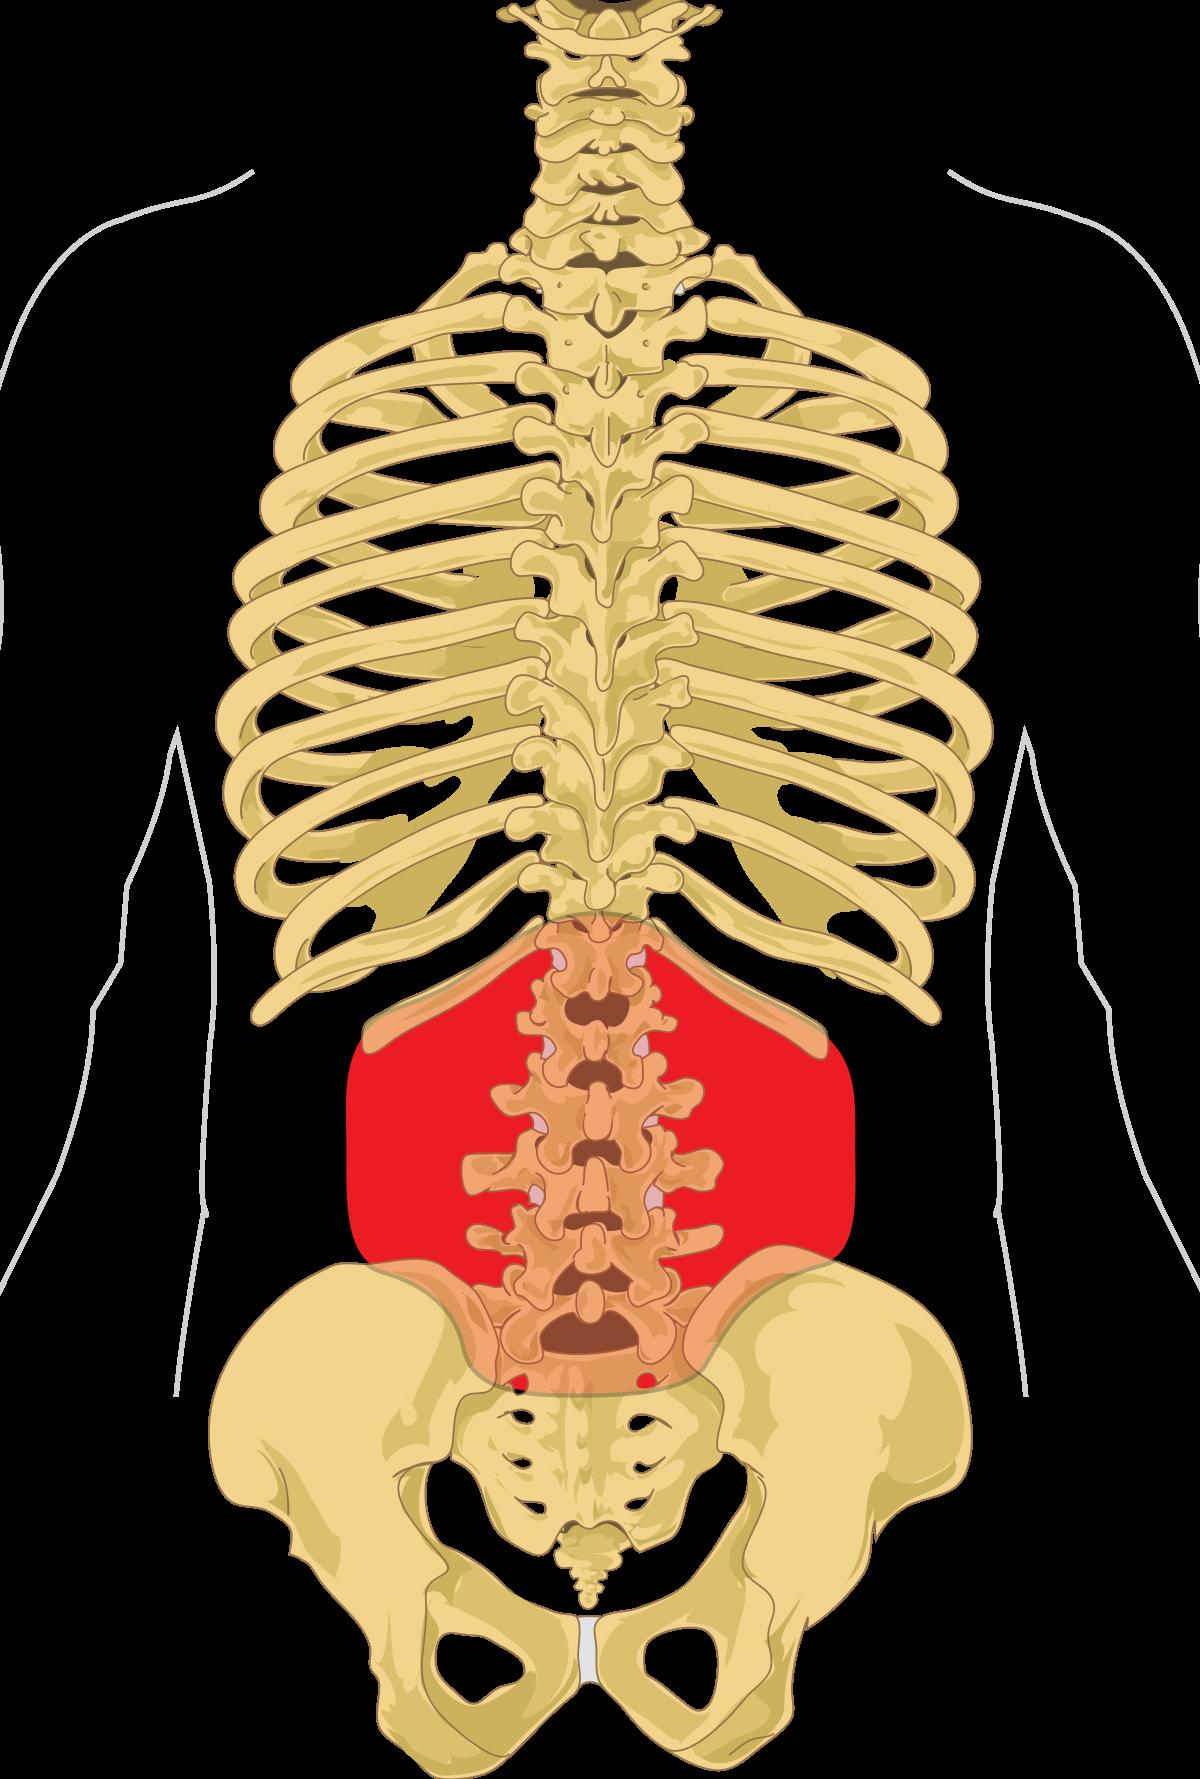 uterine cancer lower back pain)